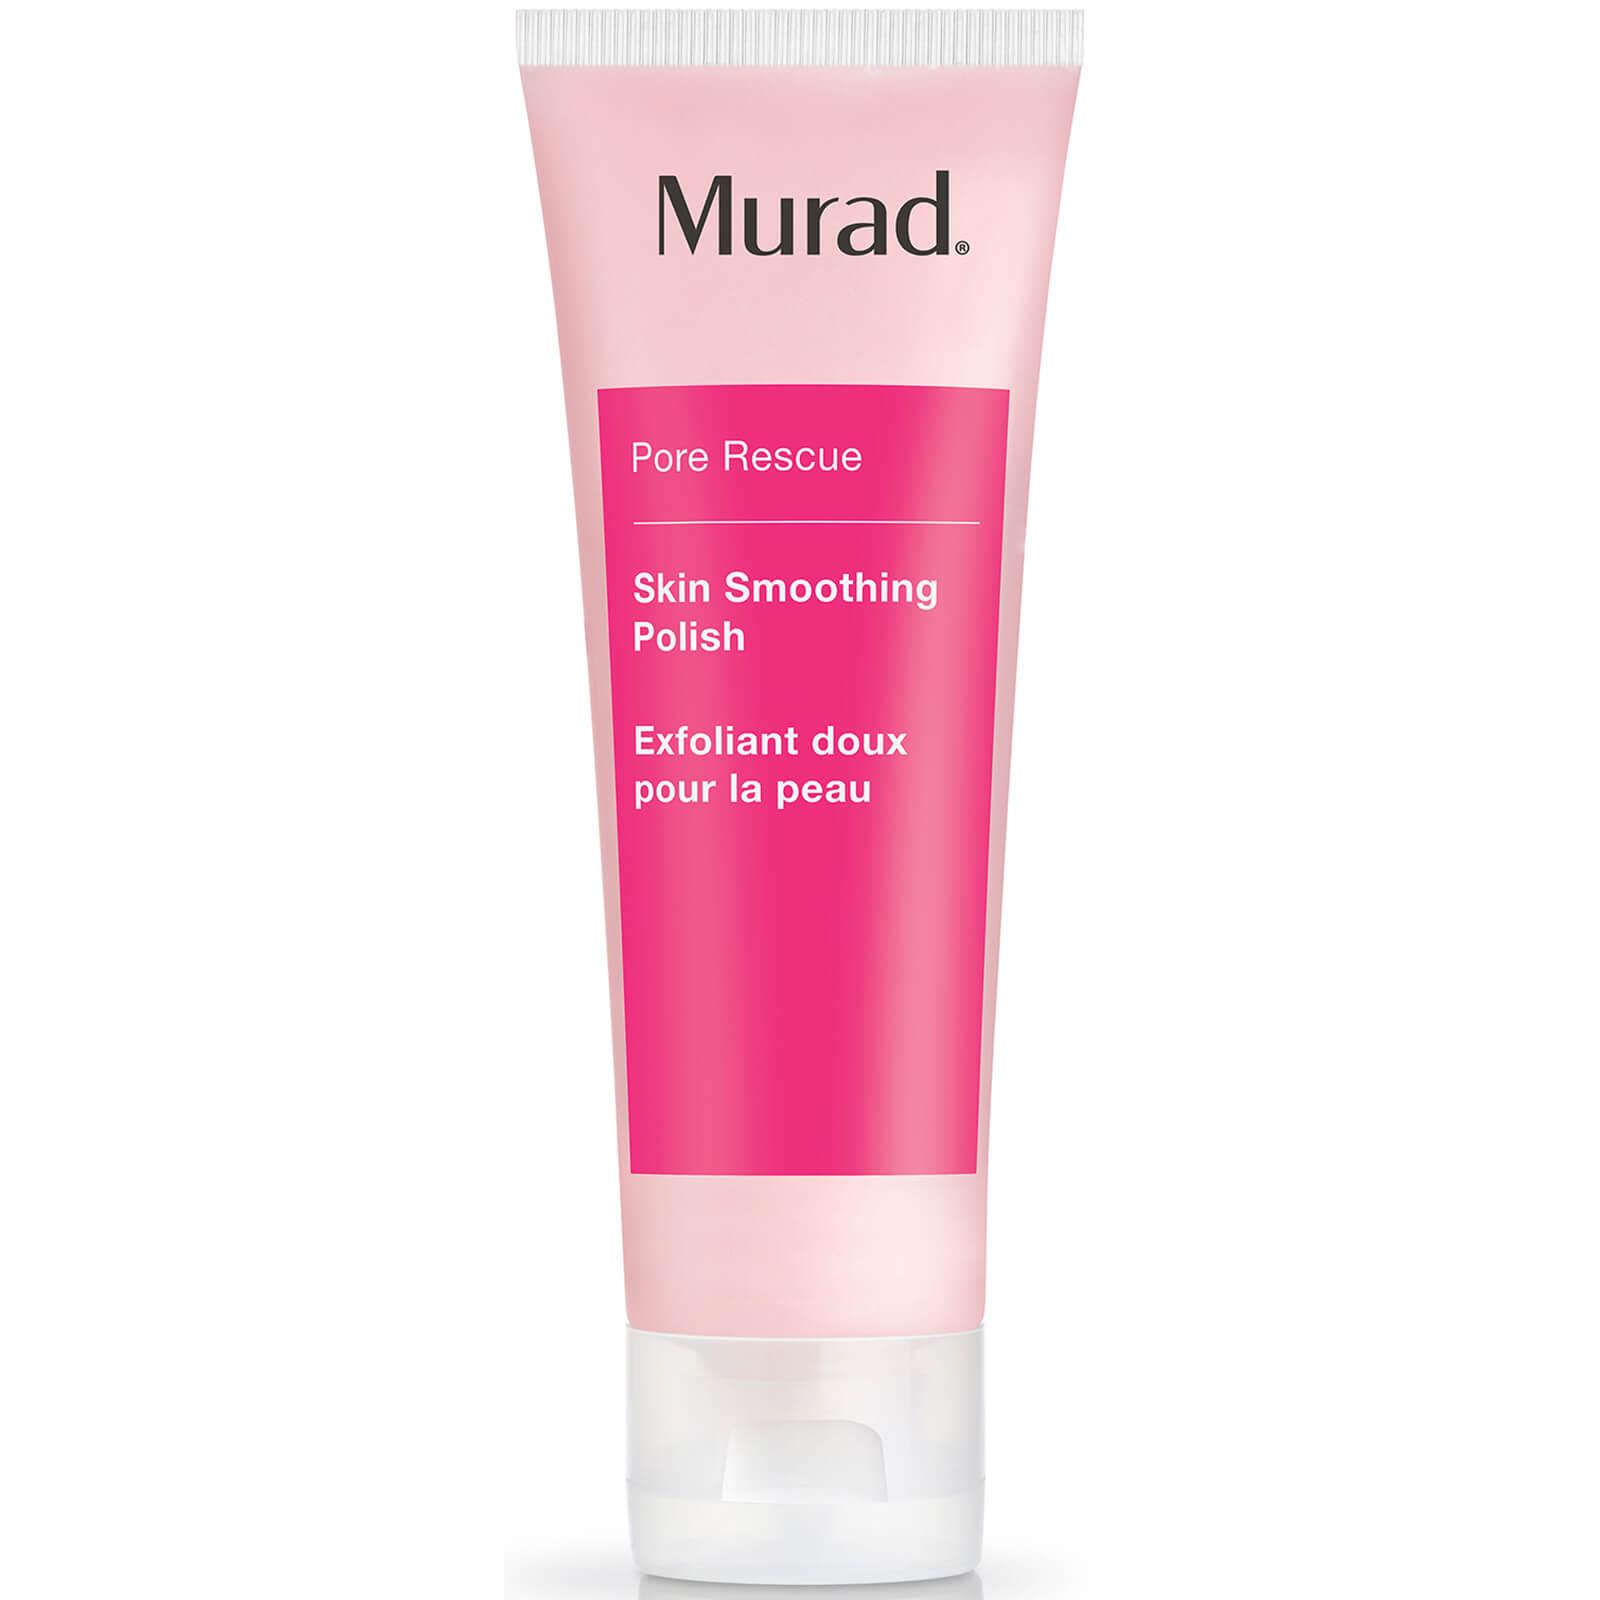 Купить Murad Pore Reform Skin Smoothing Polish Разглаживающий пилинг